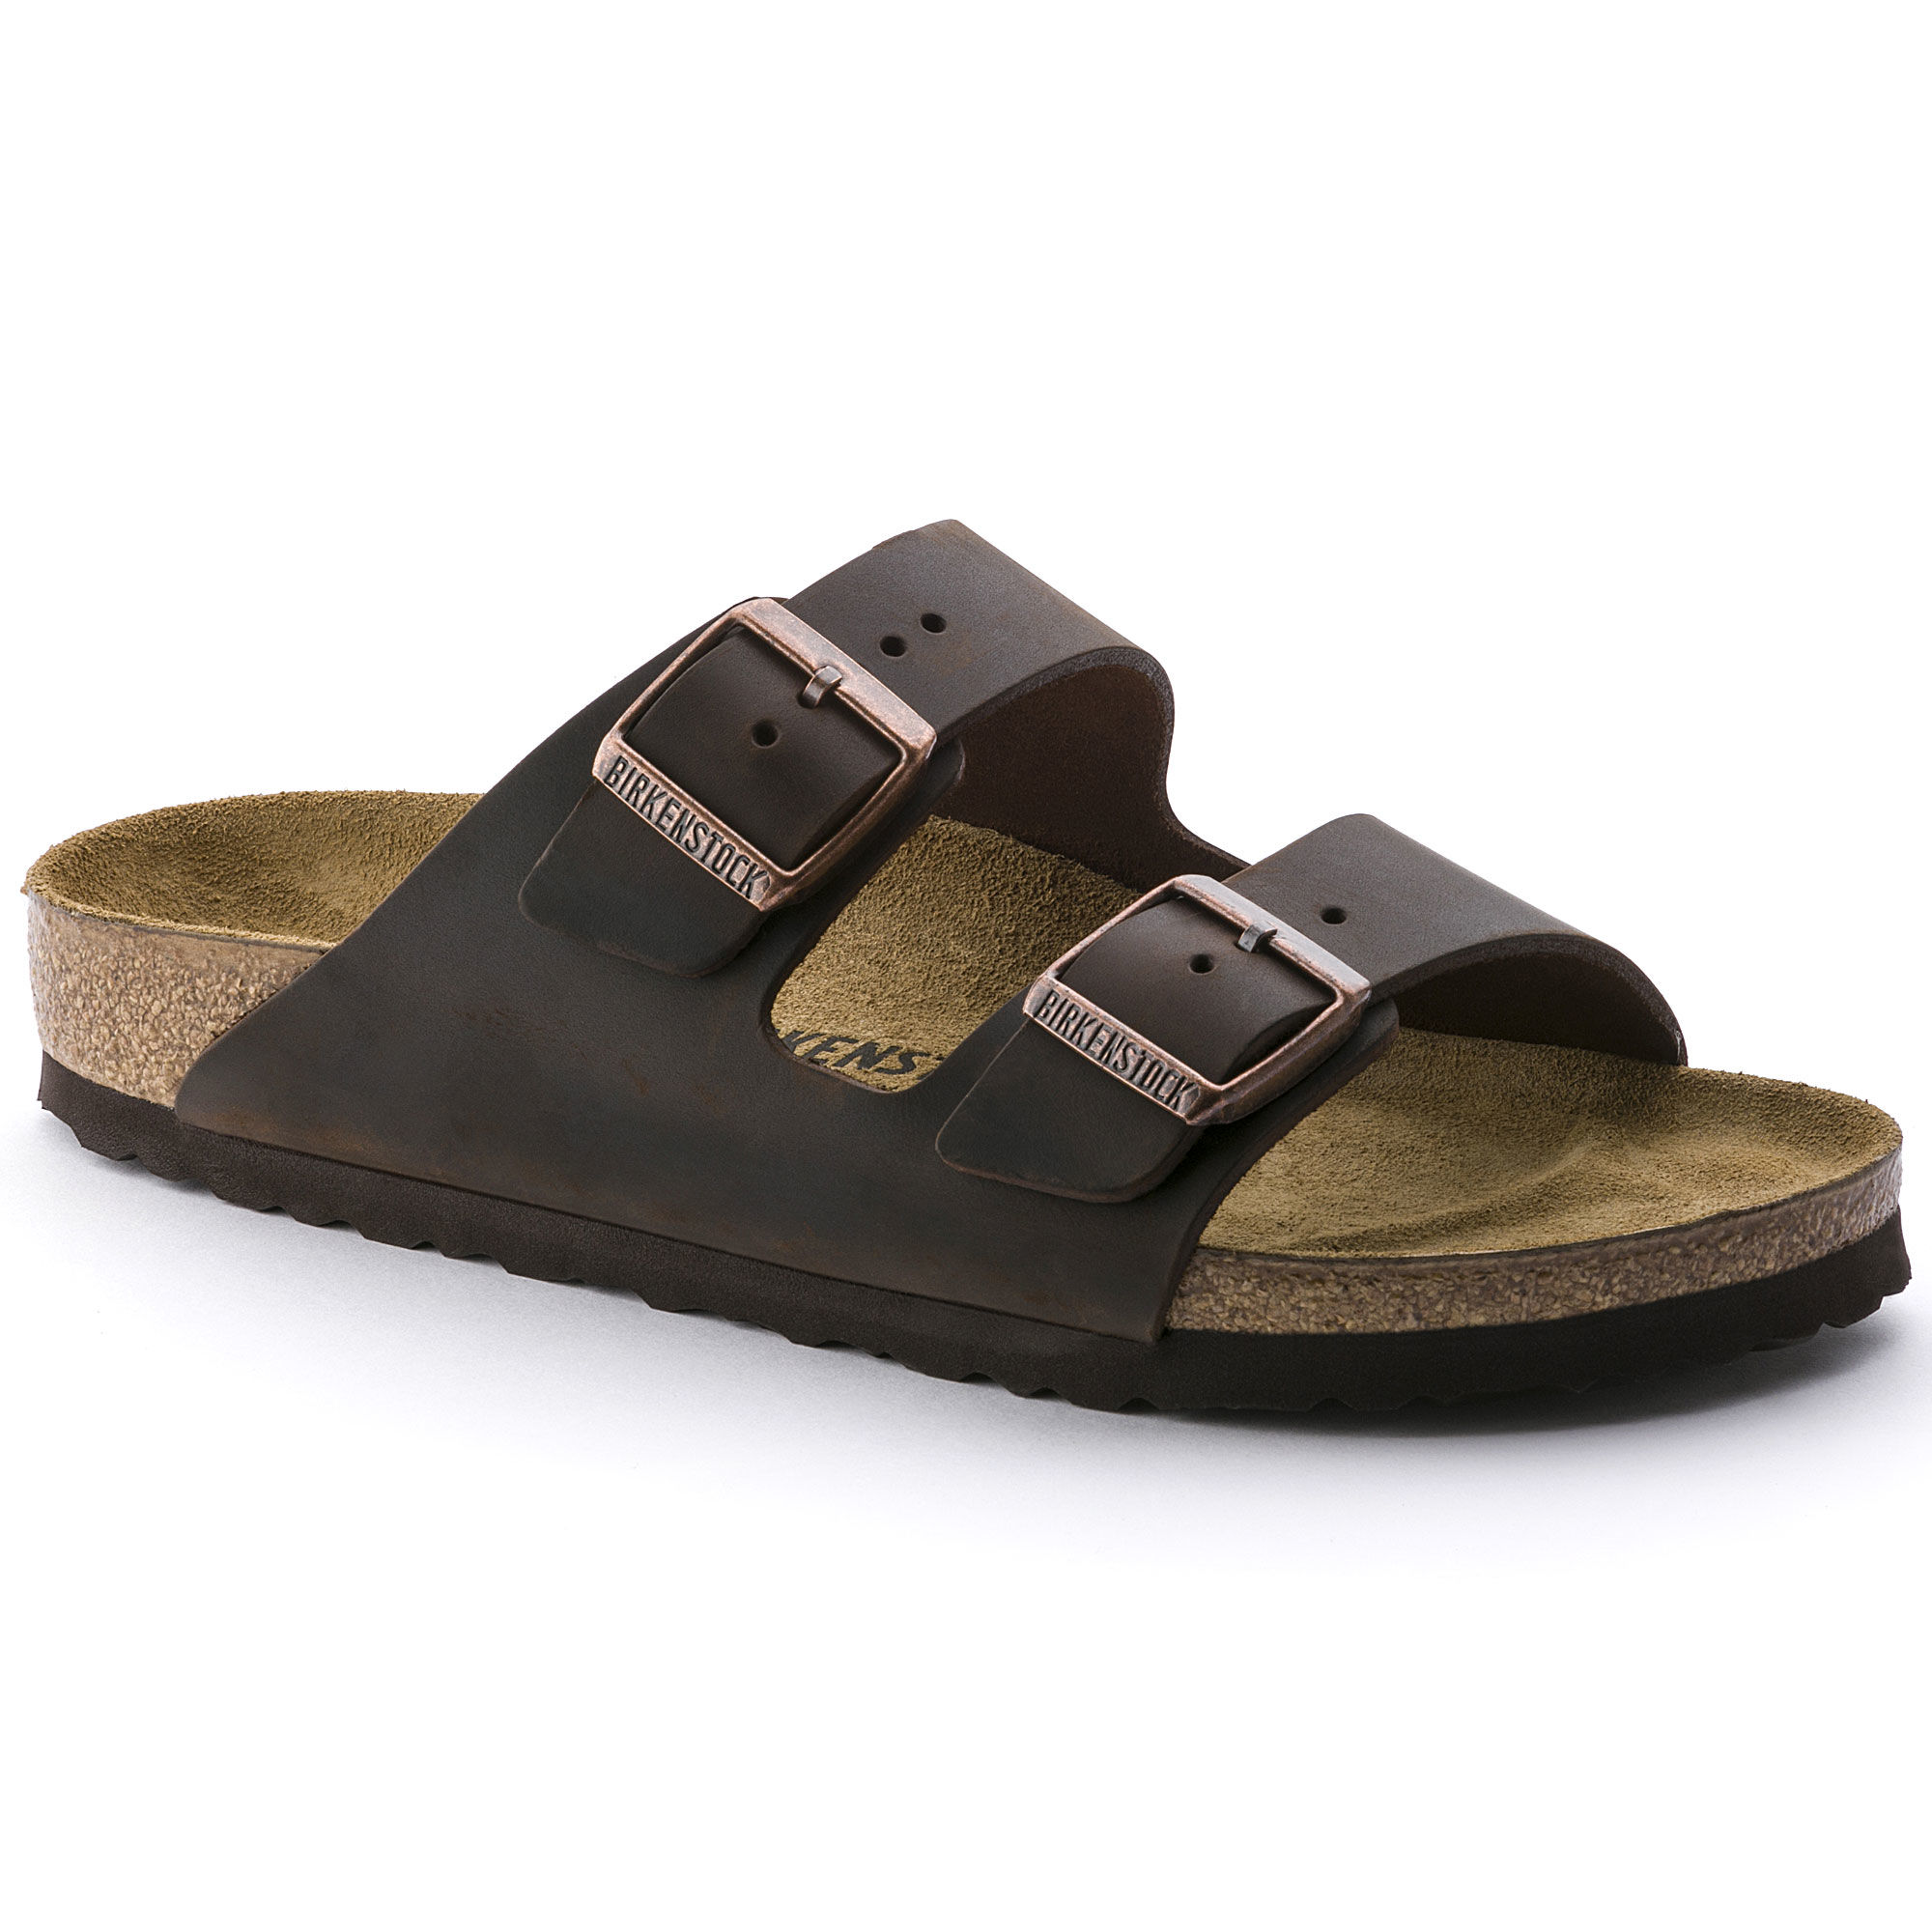 Birkenstock Arizona Habana Leather Sandals